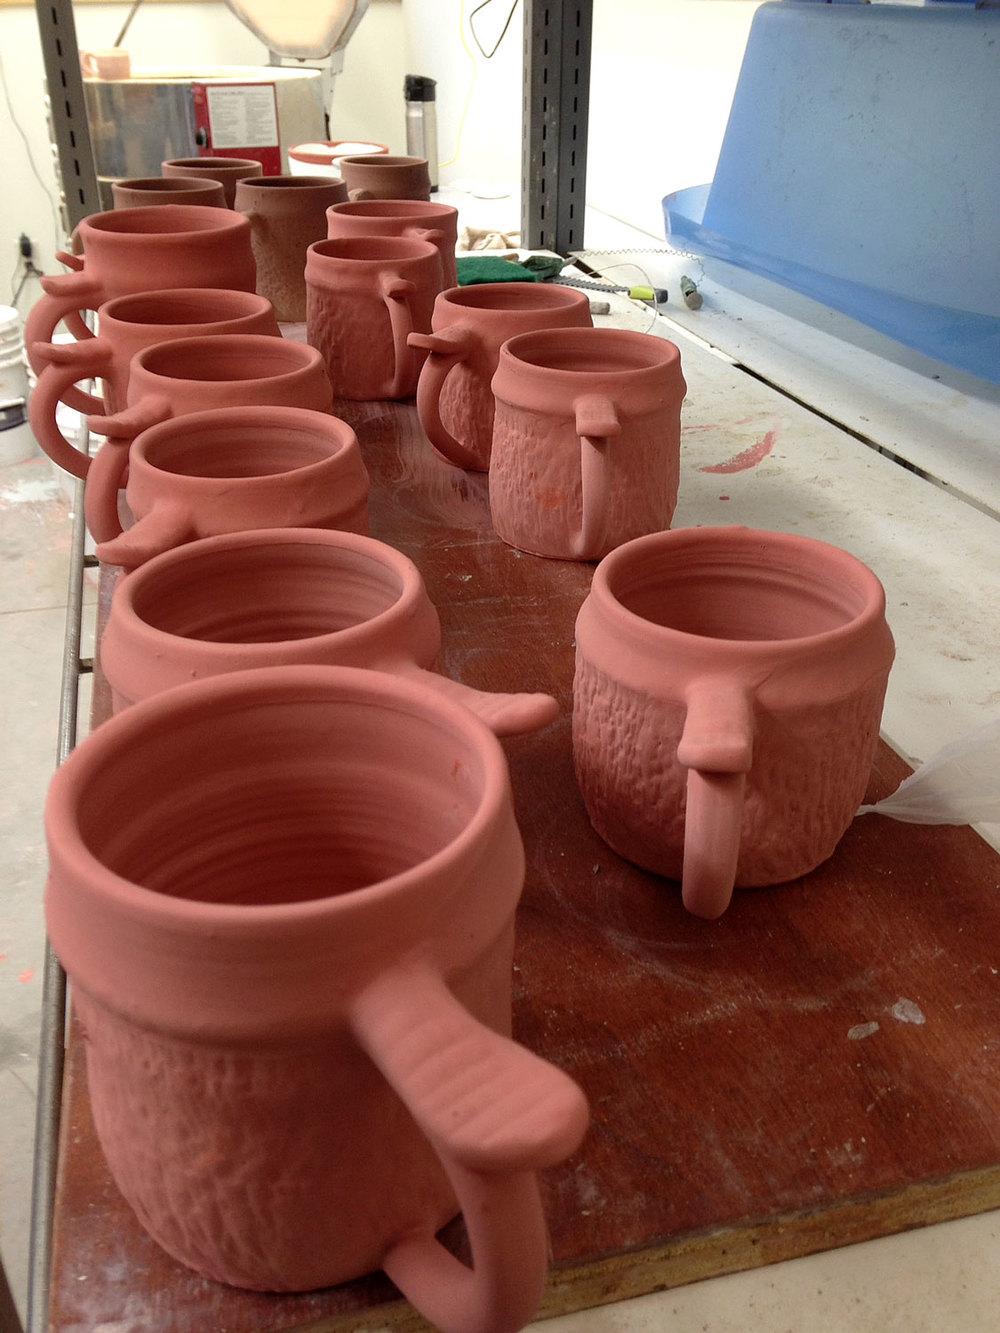 andersen-pottery-creations.jpg